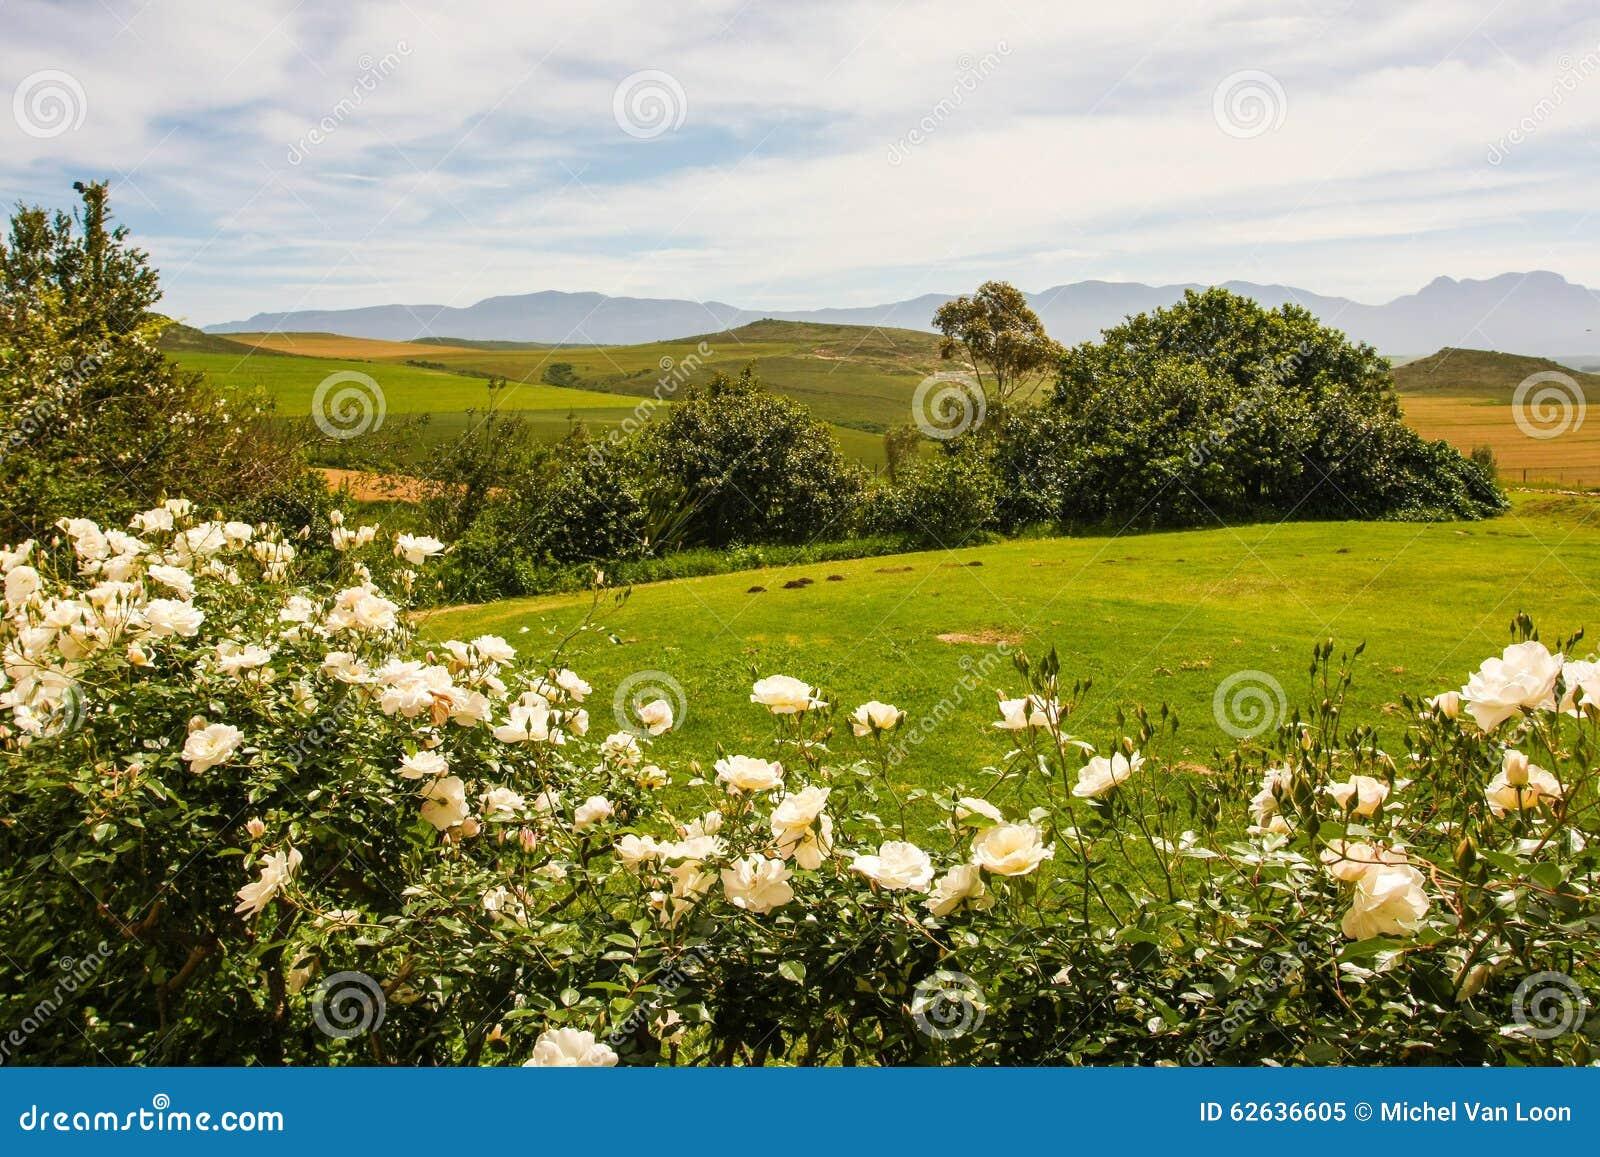 Landscape south africa stock photo image 62636605 for Landscape sa